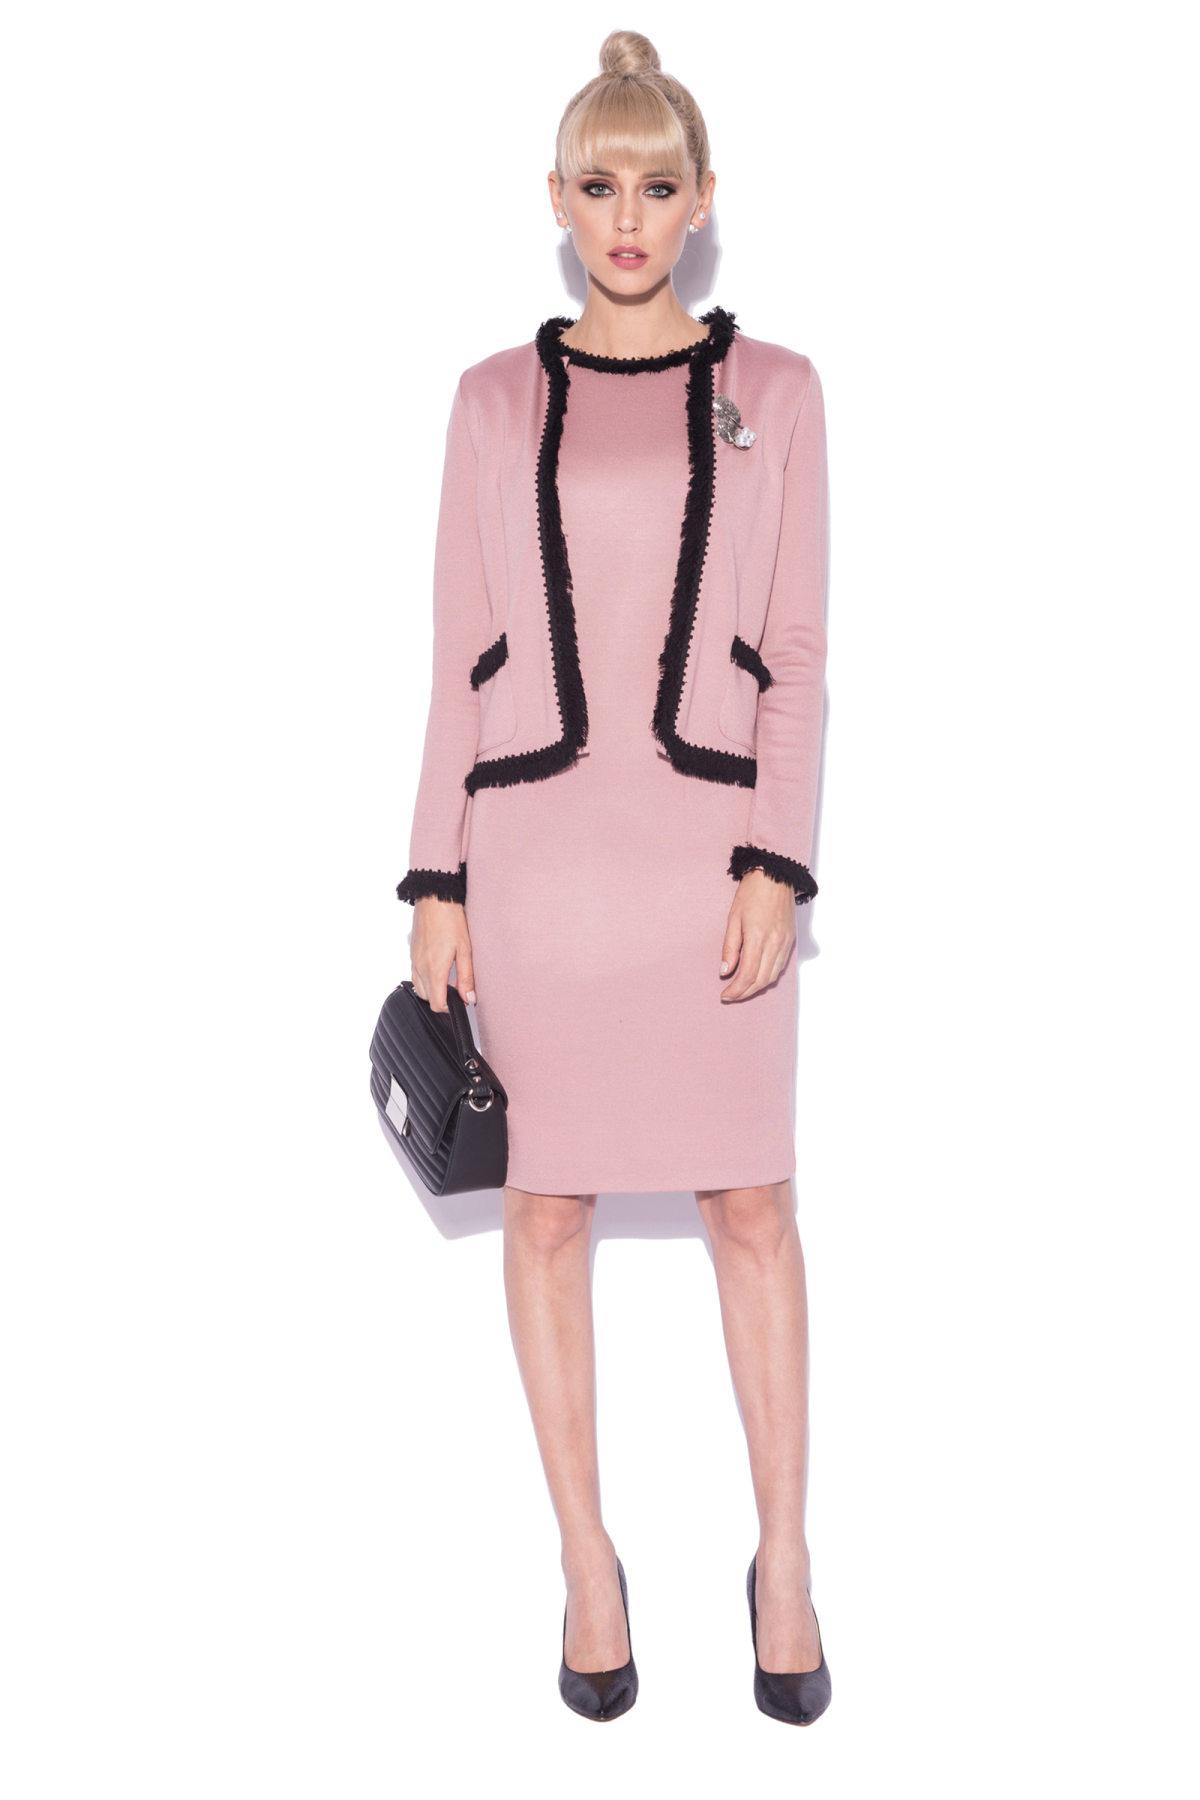 Jacheta eleganta in culori contrastante Roz